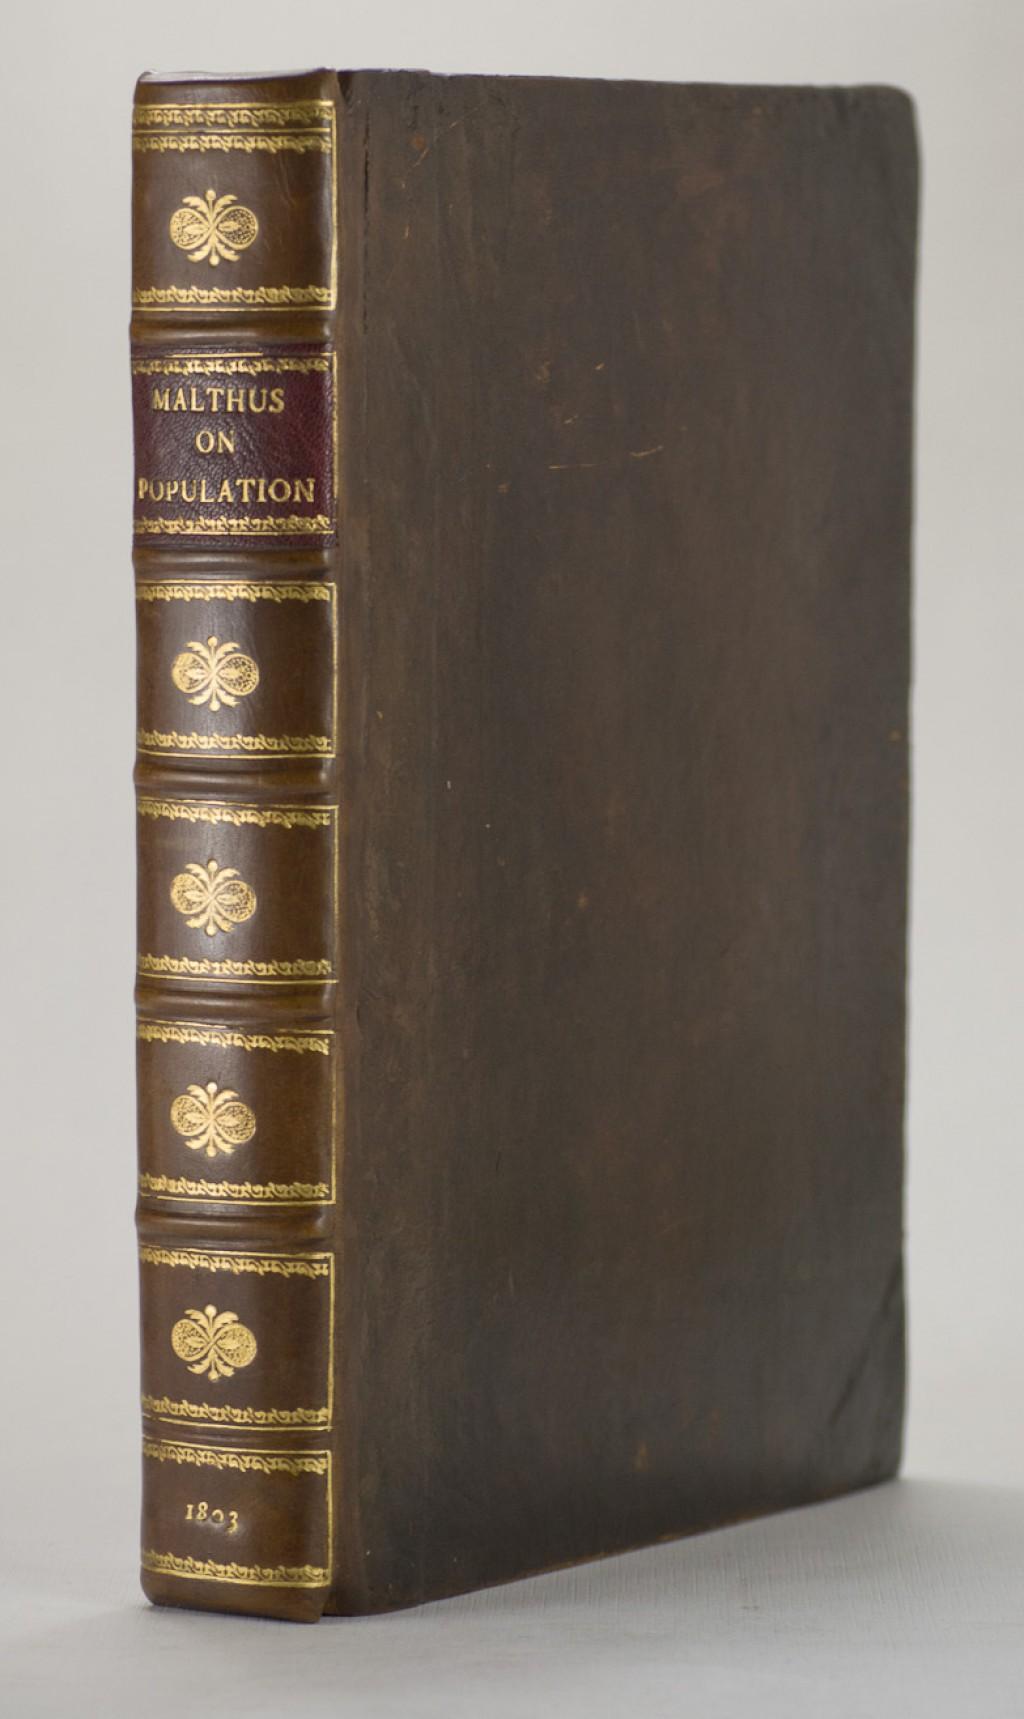 020 65276 1 Essay Example On The Principle Of Singular Population Pdf By Thomas Malthus Main Idea Large